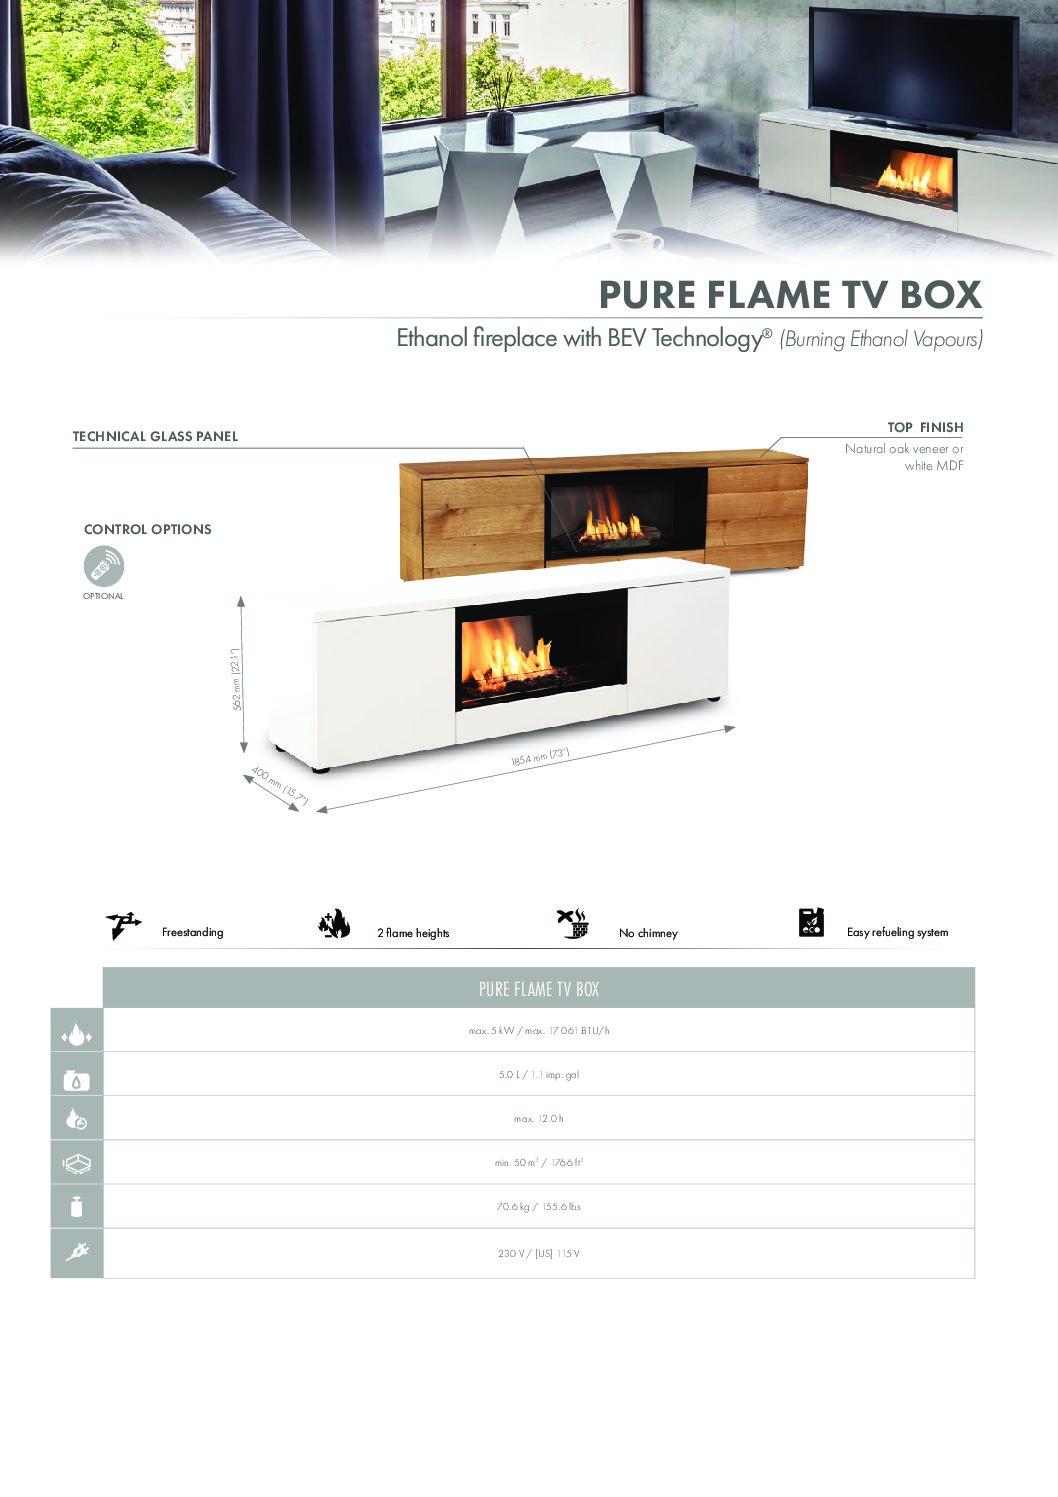 Cheminée bio-éthanol Pure Flame TV Box